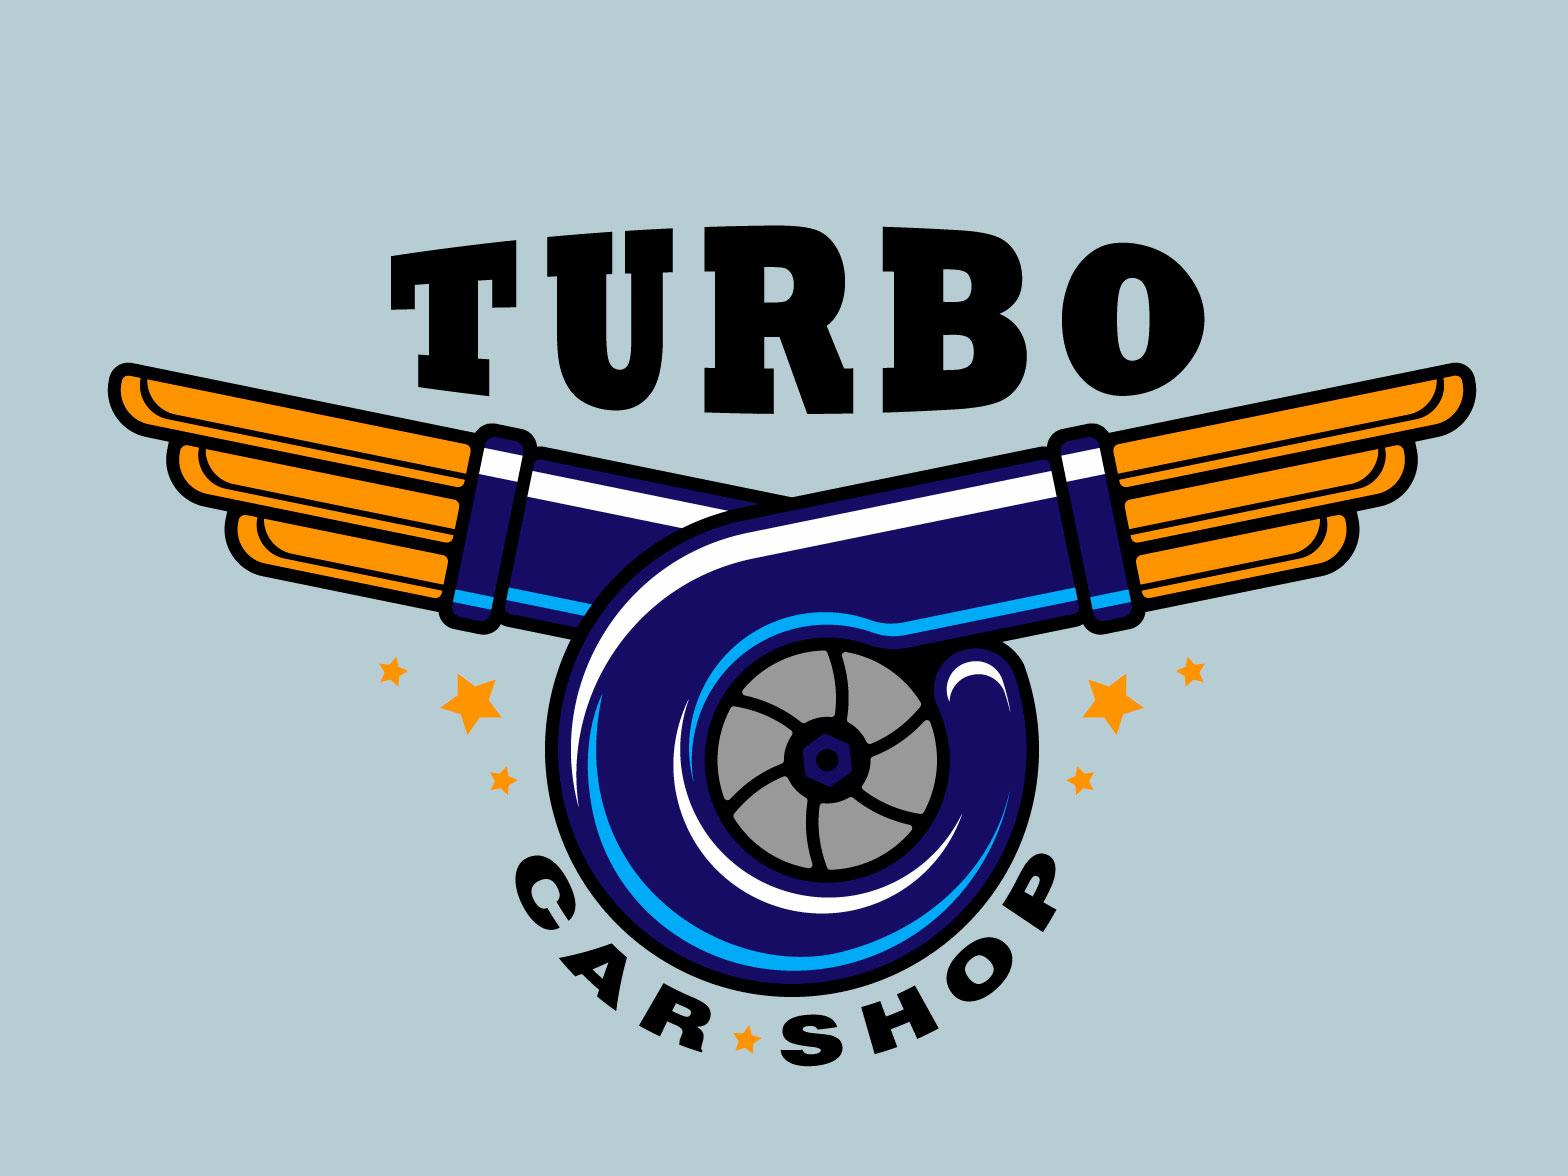 Logo Turbo Car Shop turbine flat  design illustration vector logo car workshop